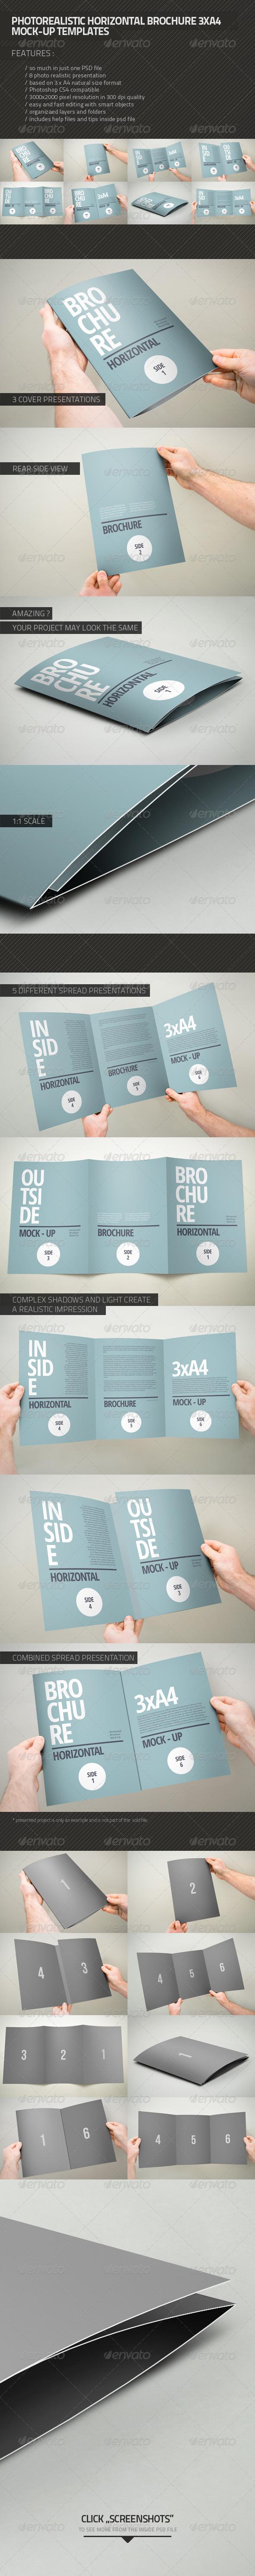 Photorealistic Brochure 3xA4 - Brochures Print